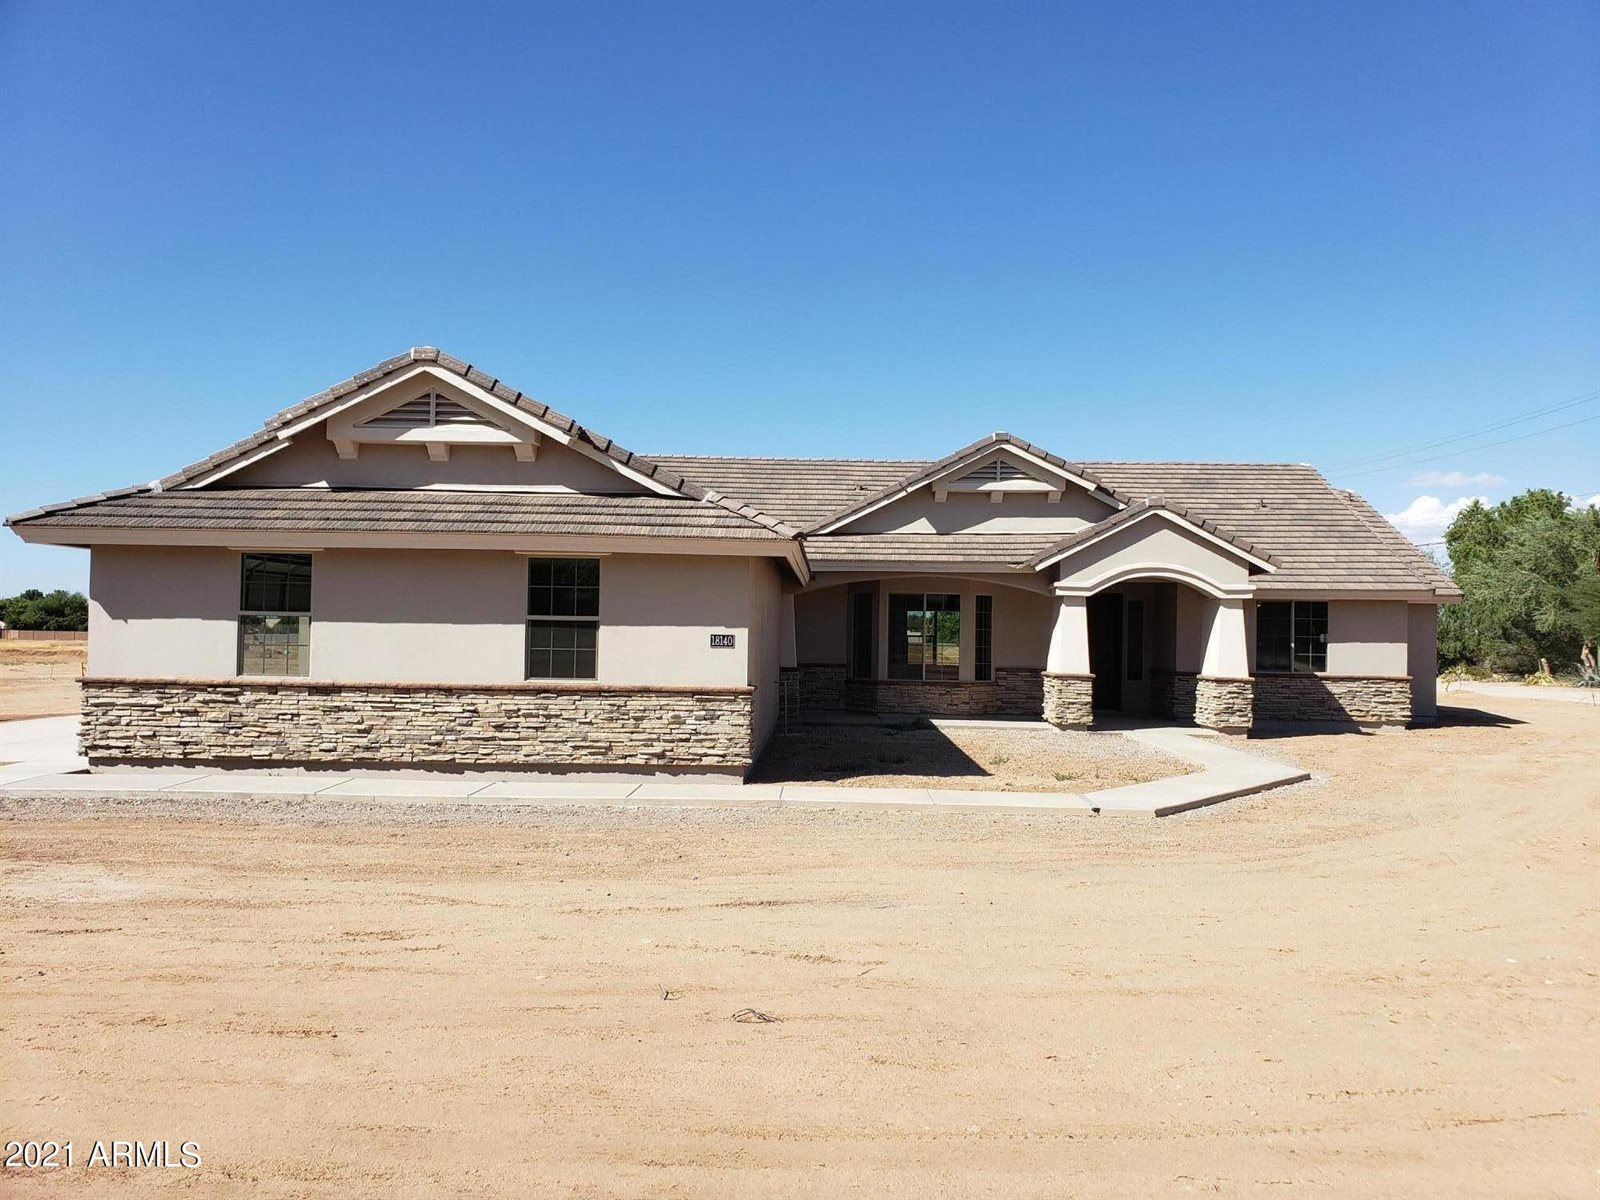 9603 East McKellips Road, Mesa, AZ 85207